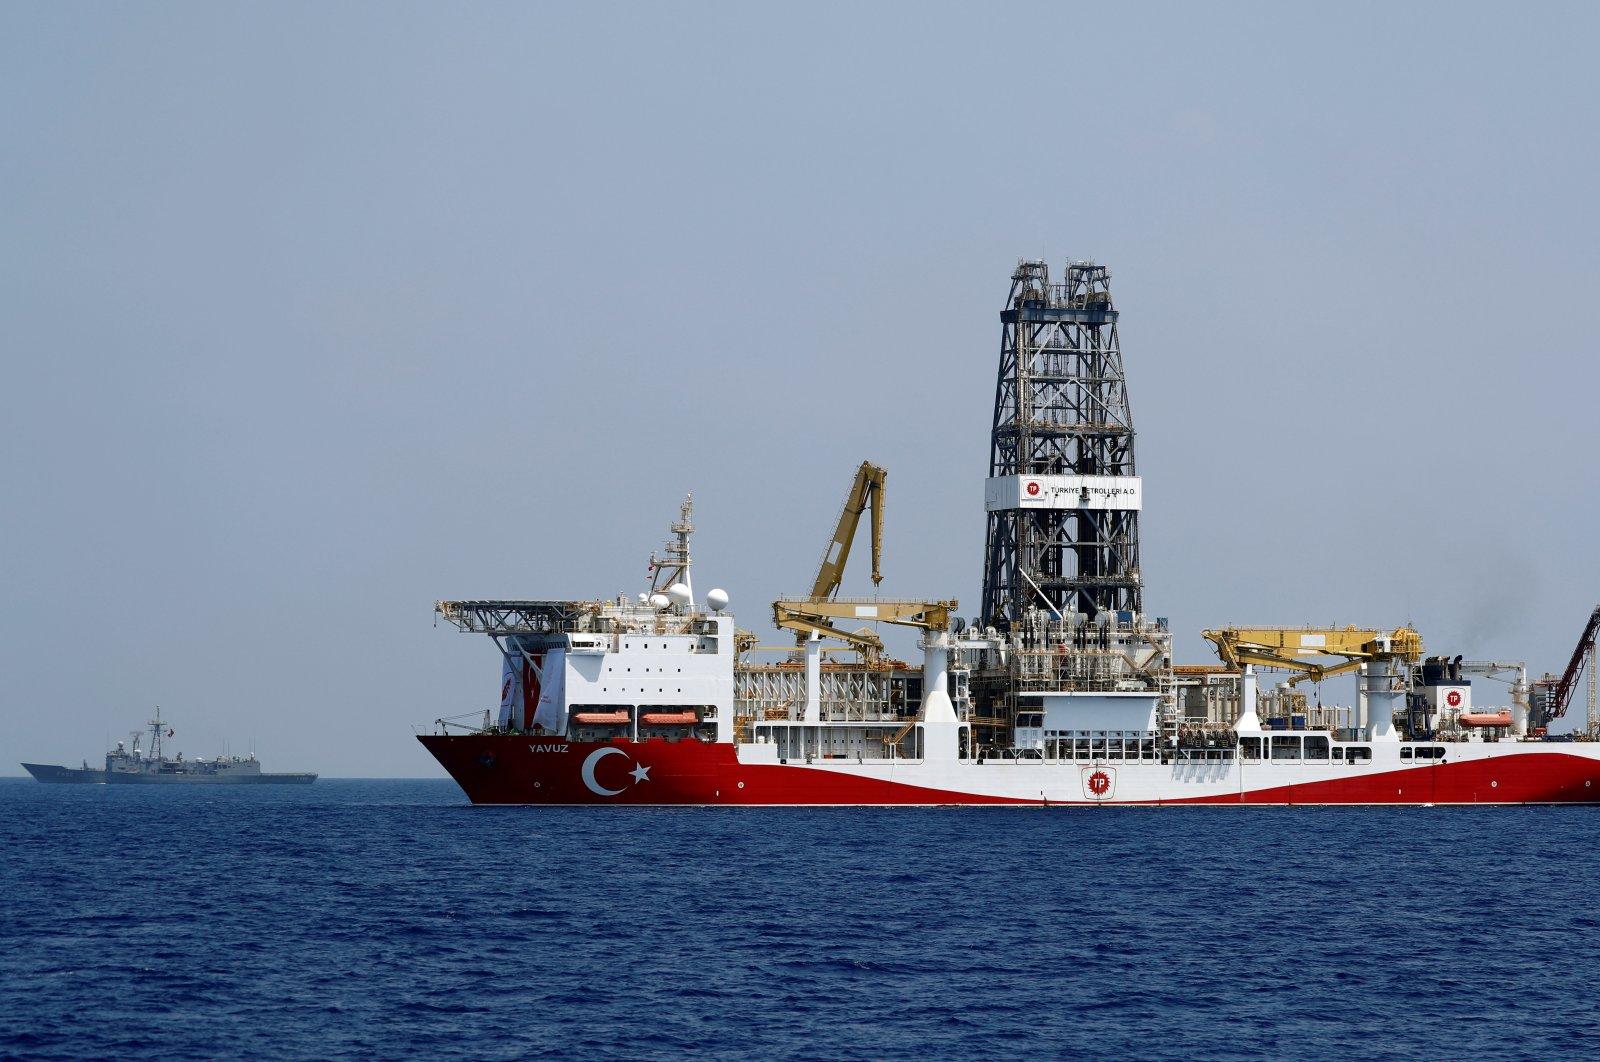 Turkish drilling vessel Yavuz is escorted by Turkish navy frigate TCG Gemlik (F-492) in the Eastern Mediterranean Sea off the island of Cyprus, Aug. 6, 2019. (Reuters Photo)